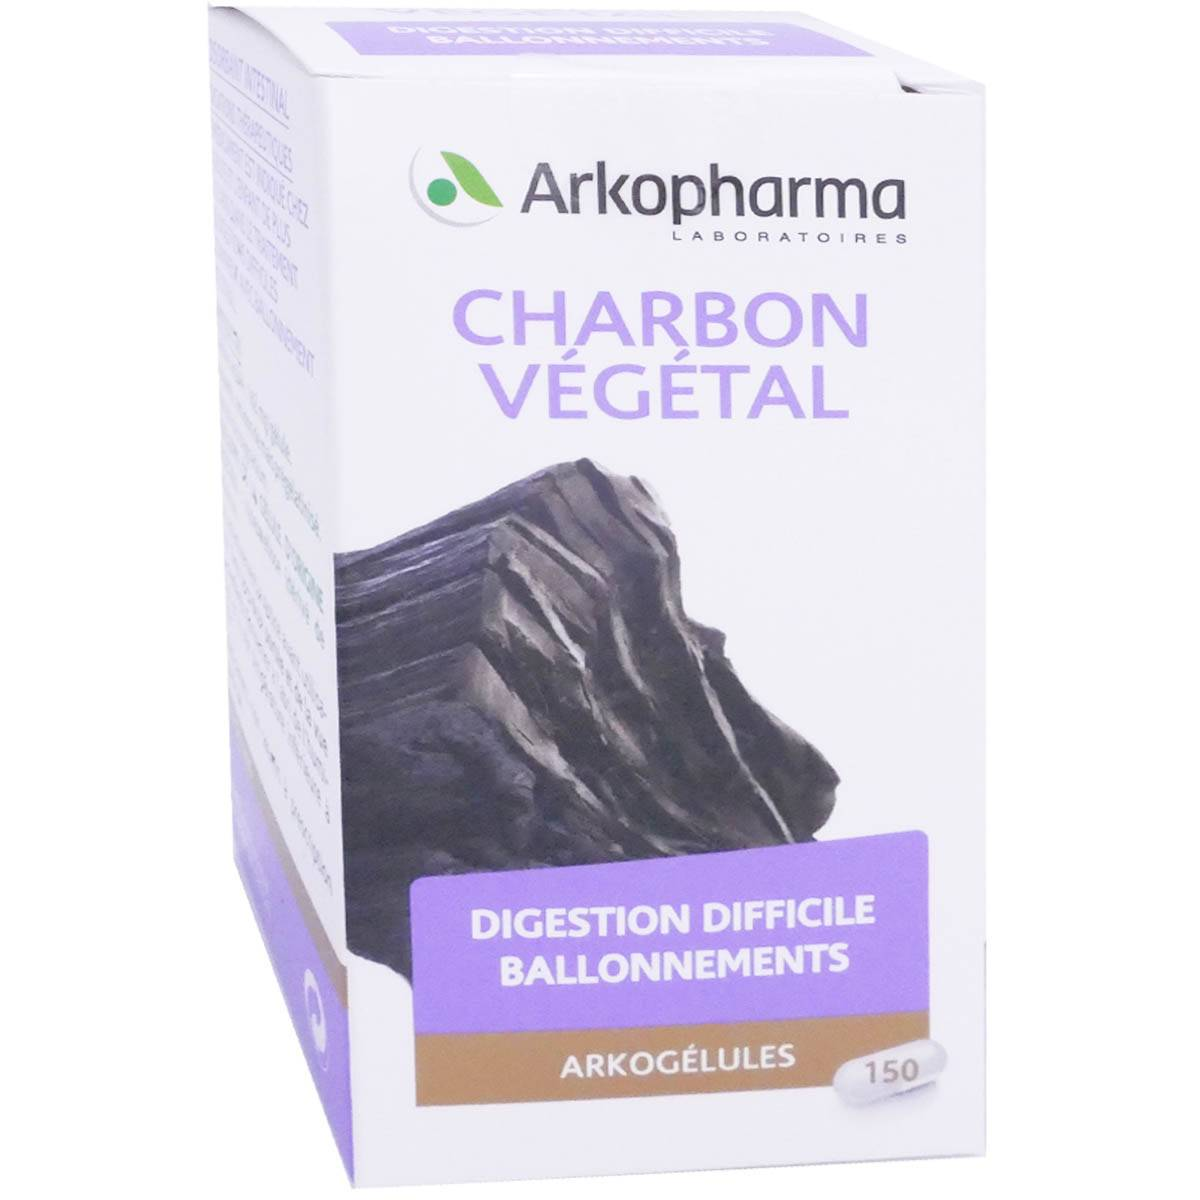 Arkopharma charbon vÉgÉtal 150 arkogelules digestion